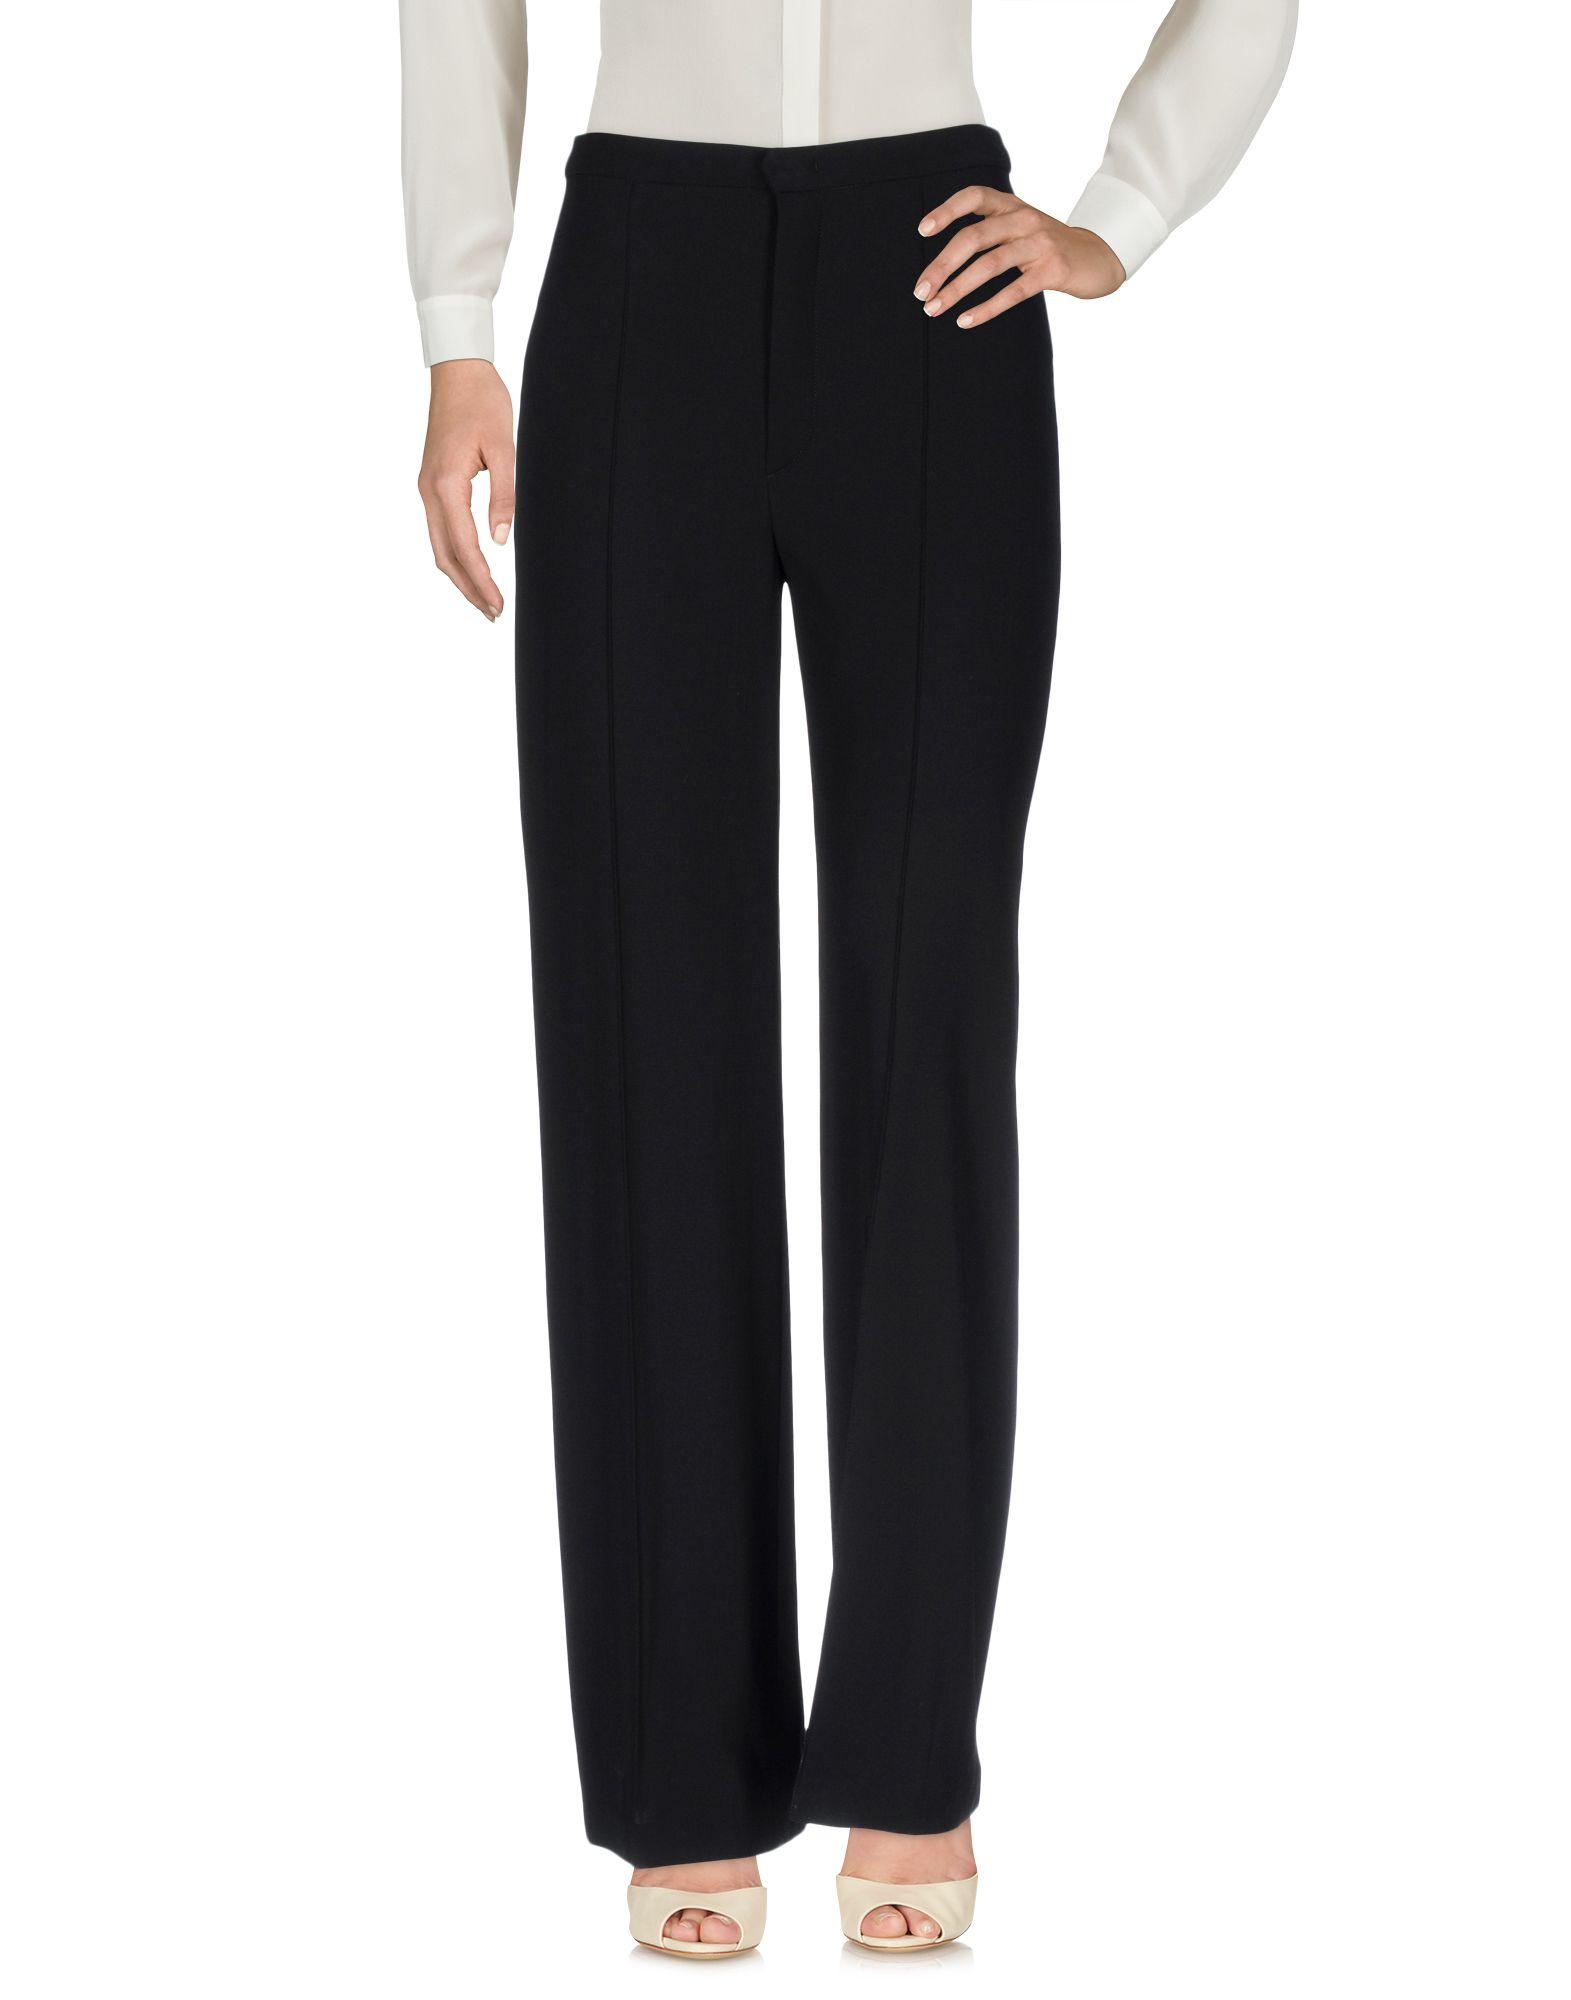 Pantalone Isabel Marant Donna - Acquista online su yJYgiY09